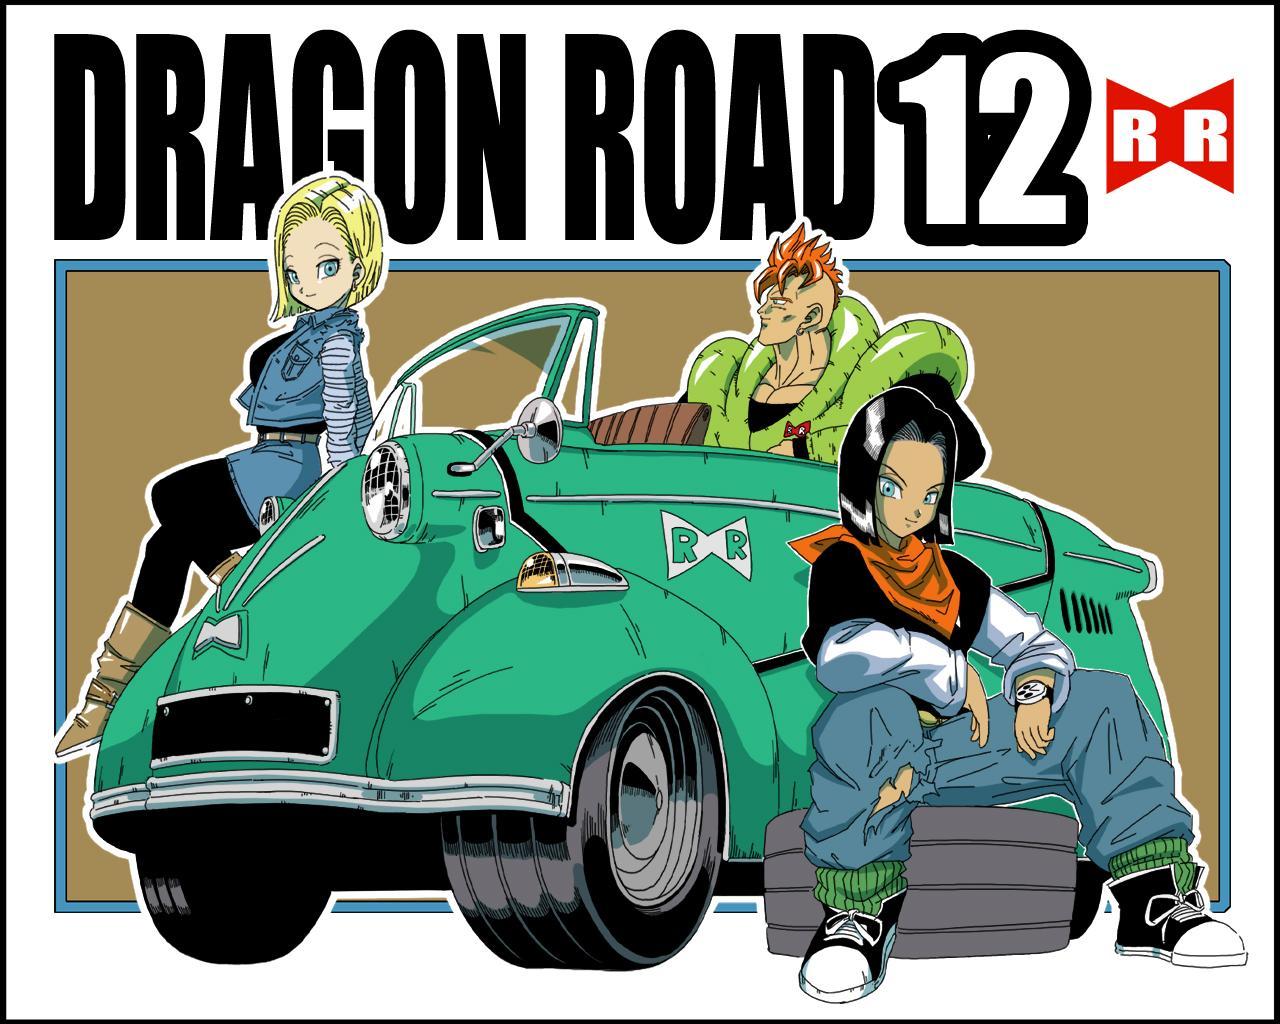 DRAGON ROAD 12 28